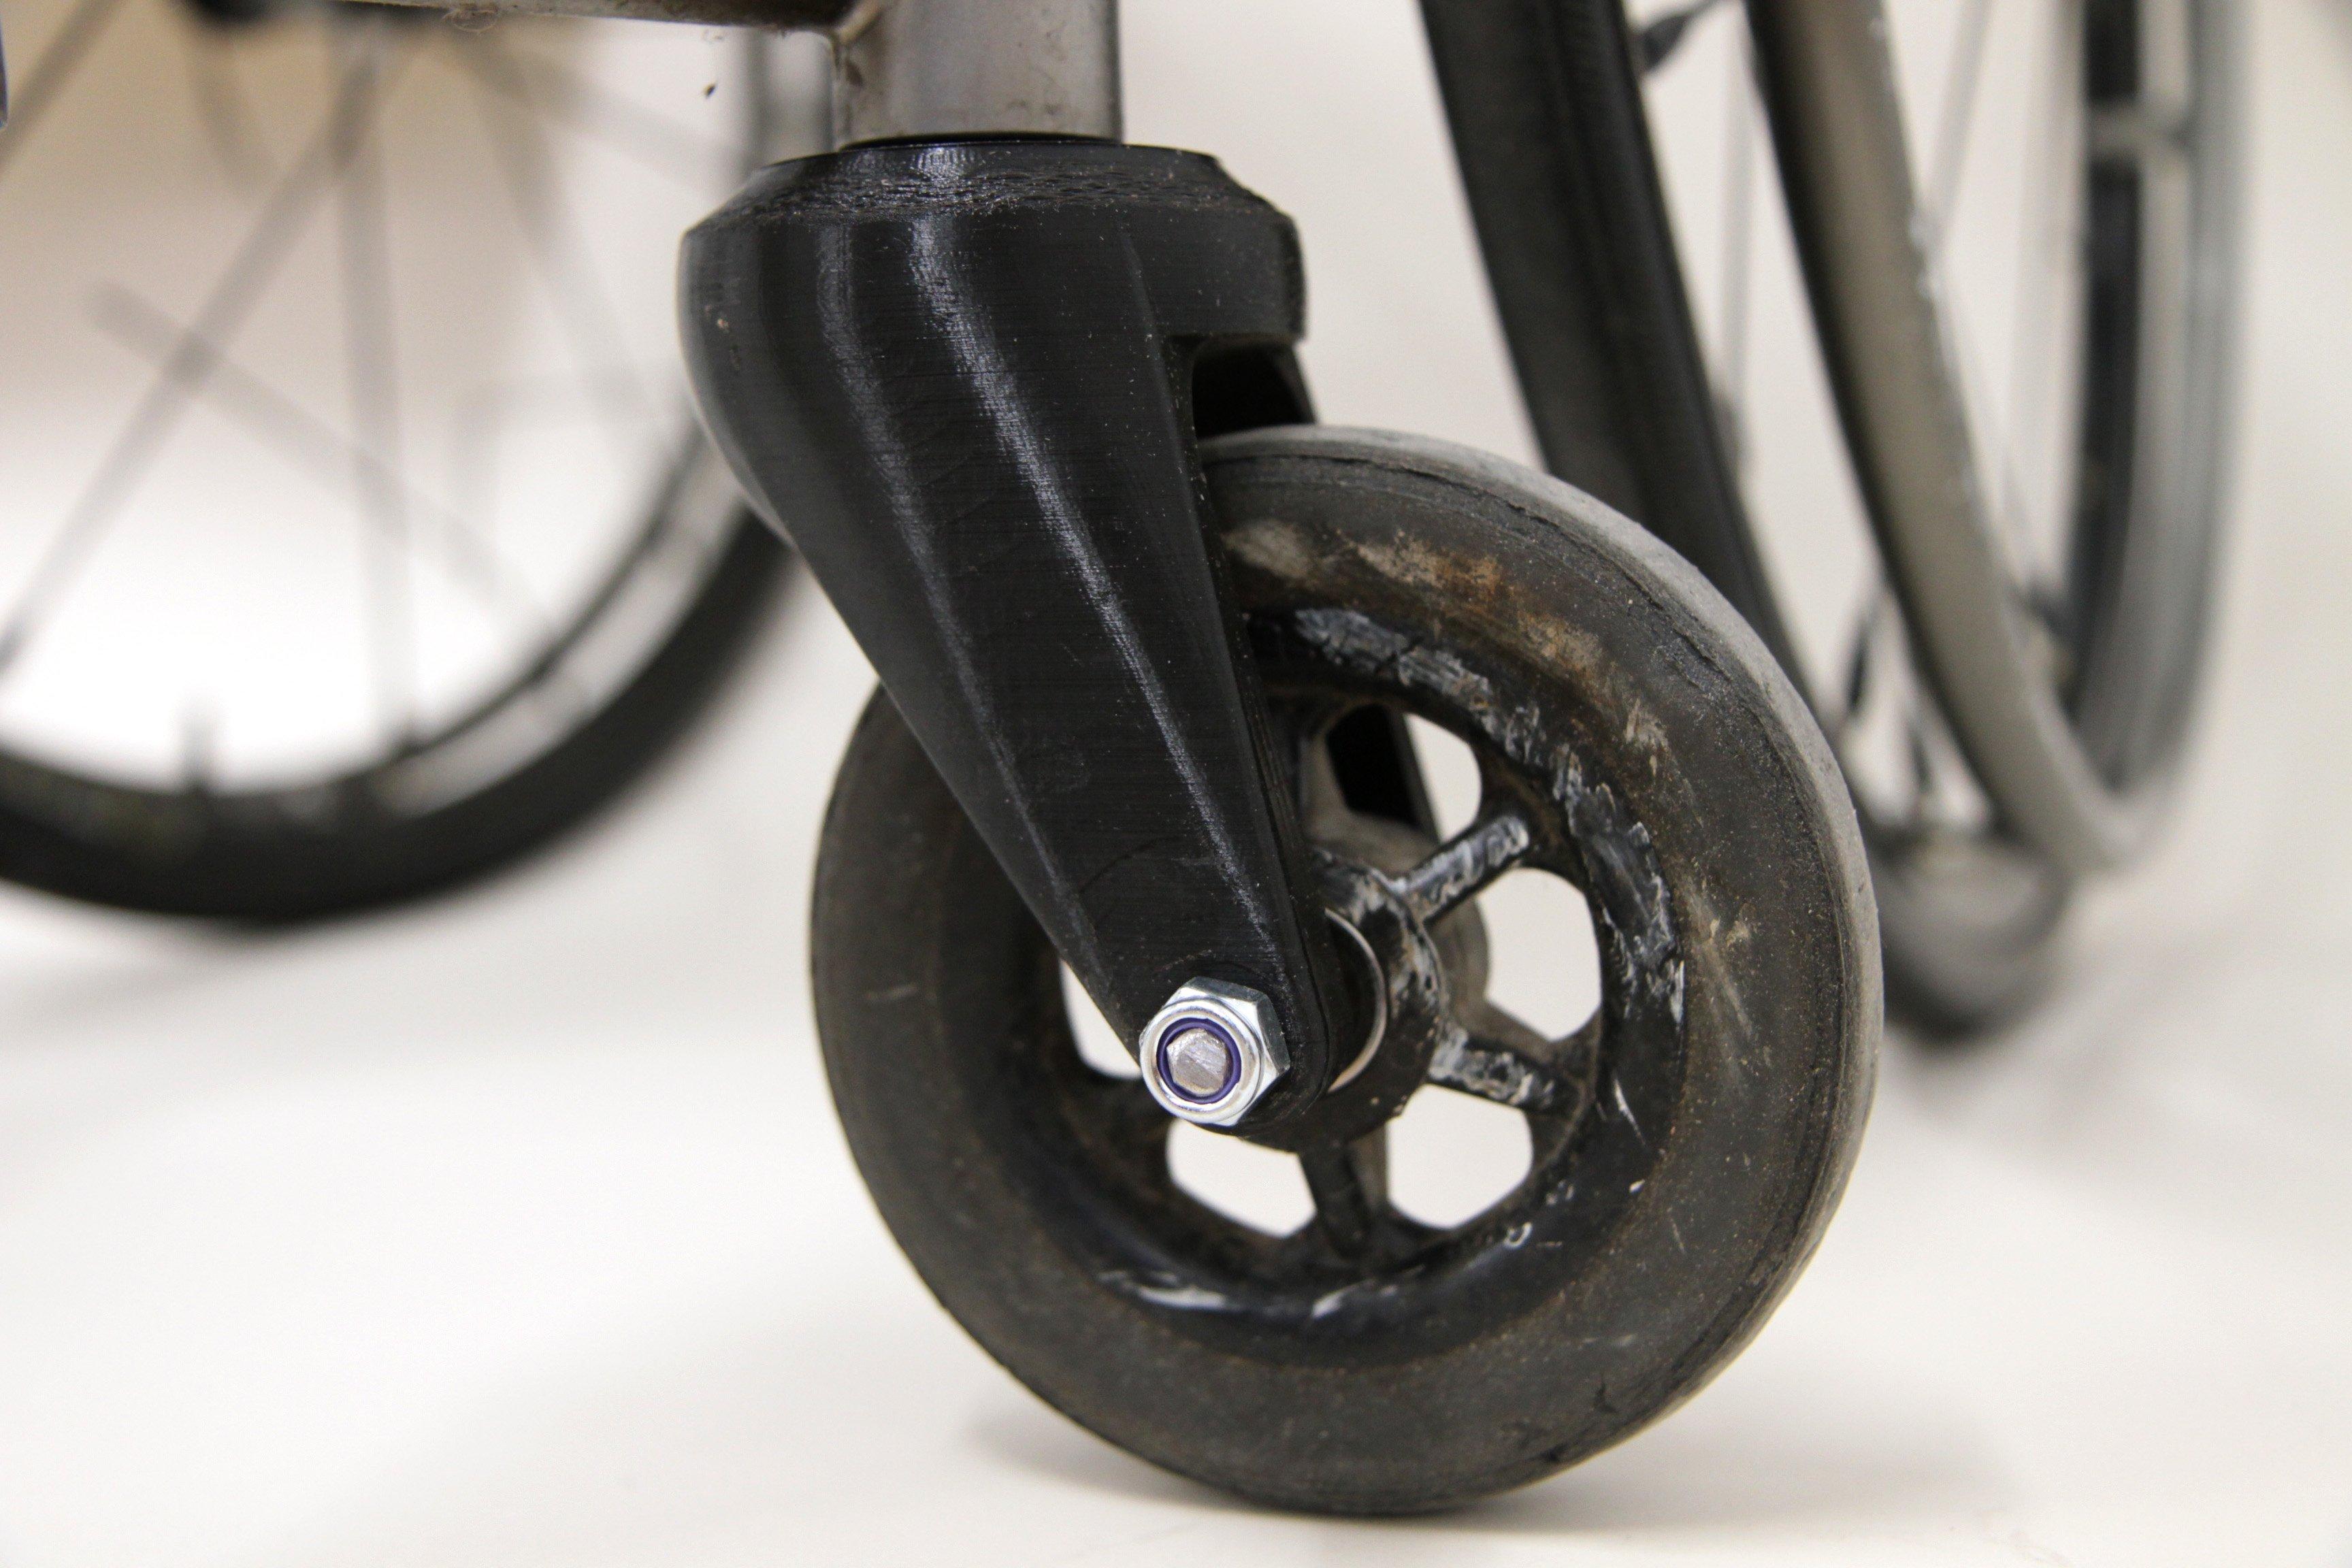 Wheel from a wheelchair